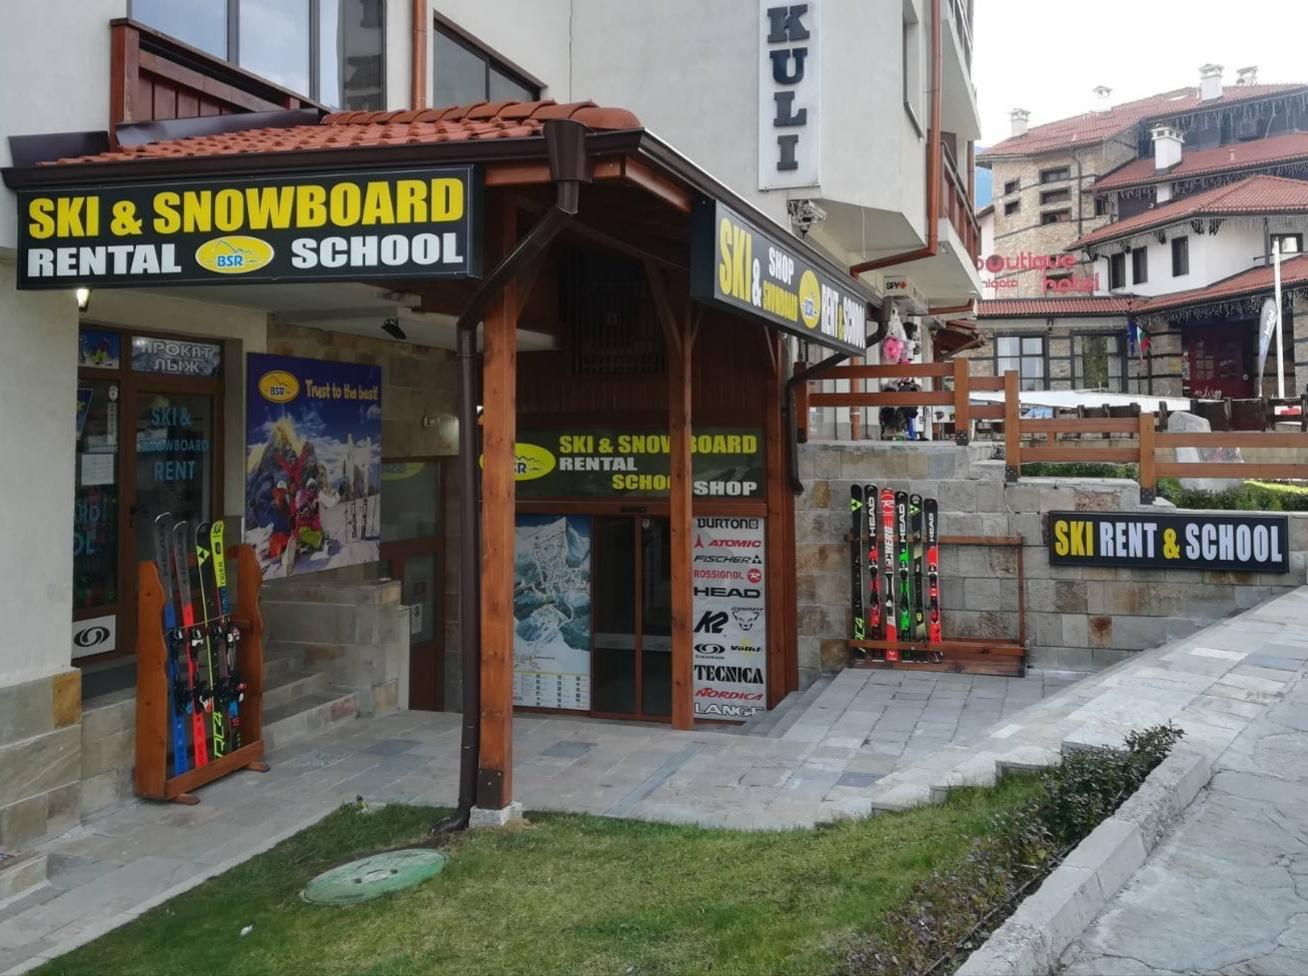 Bankso Ski & Snowboard School